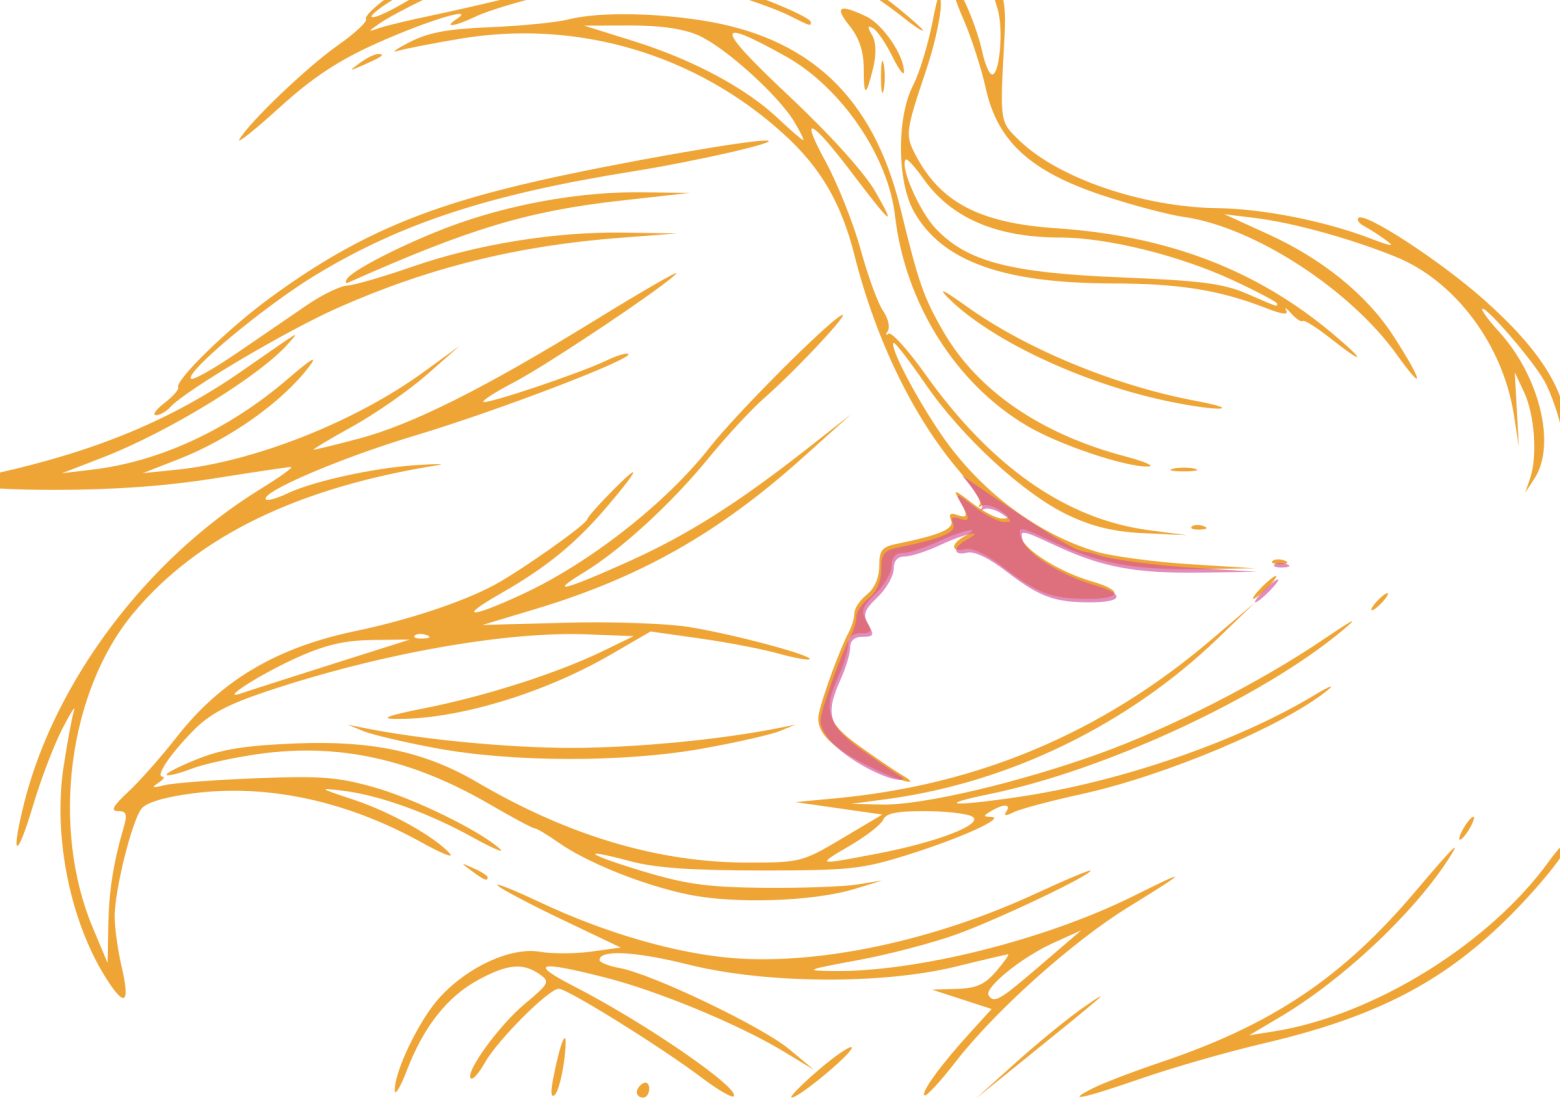 clipart coiffure images gratuites illustrations coiffure dessin.